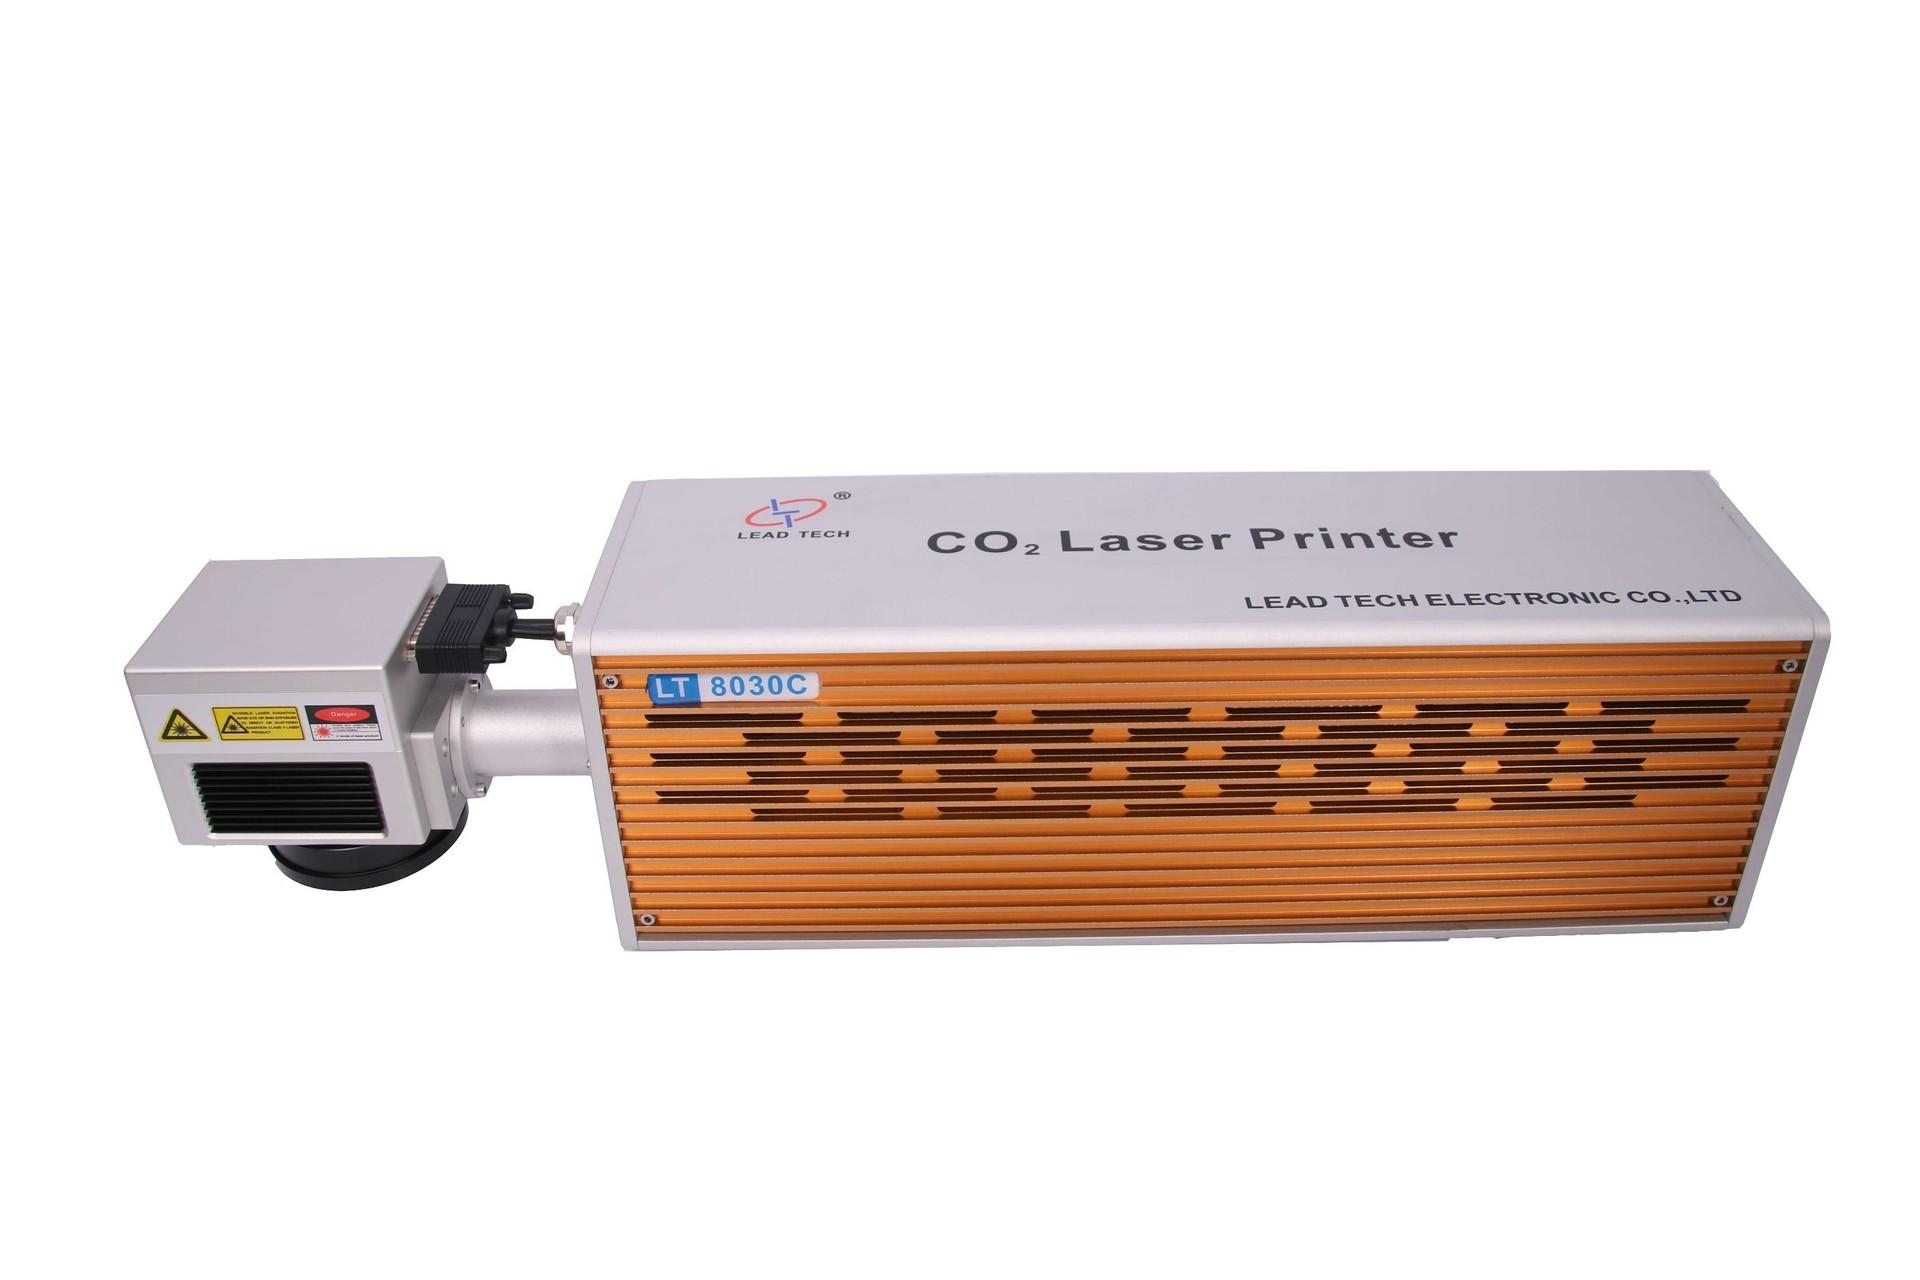 Lt8020c/Lt8030c CO2 20W/30W Digital High Speed Laser Printer for Stainless Steel